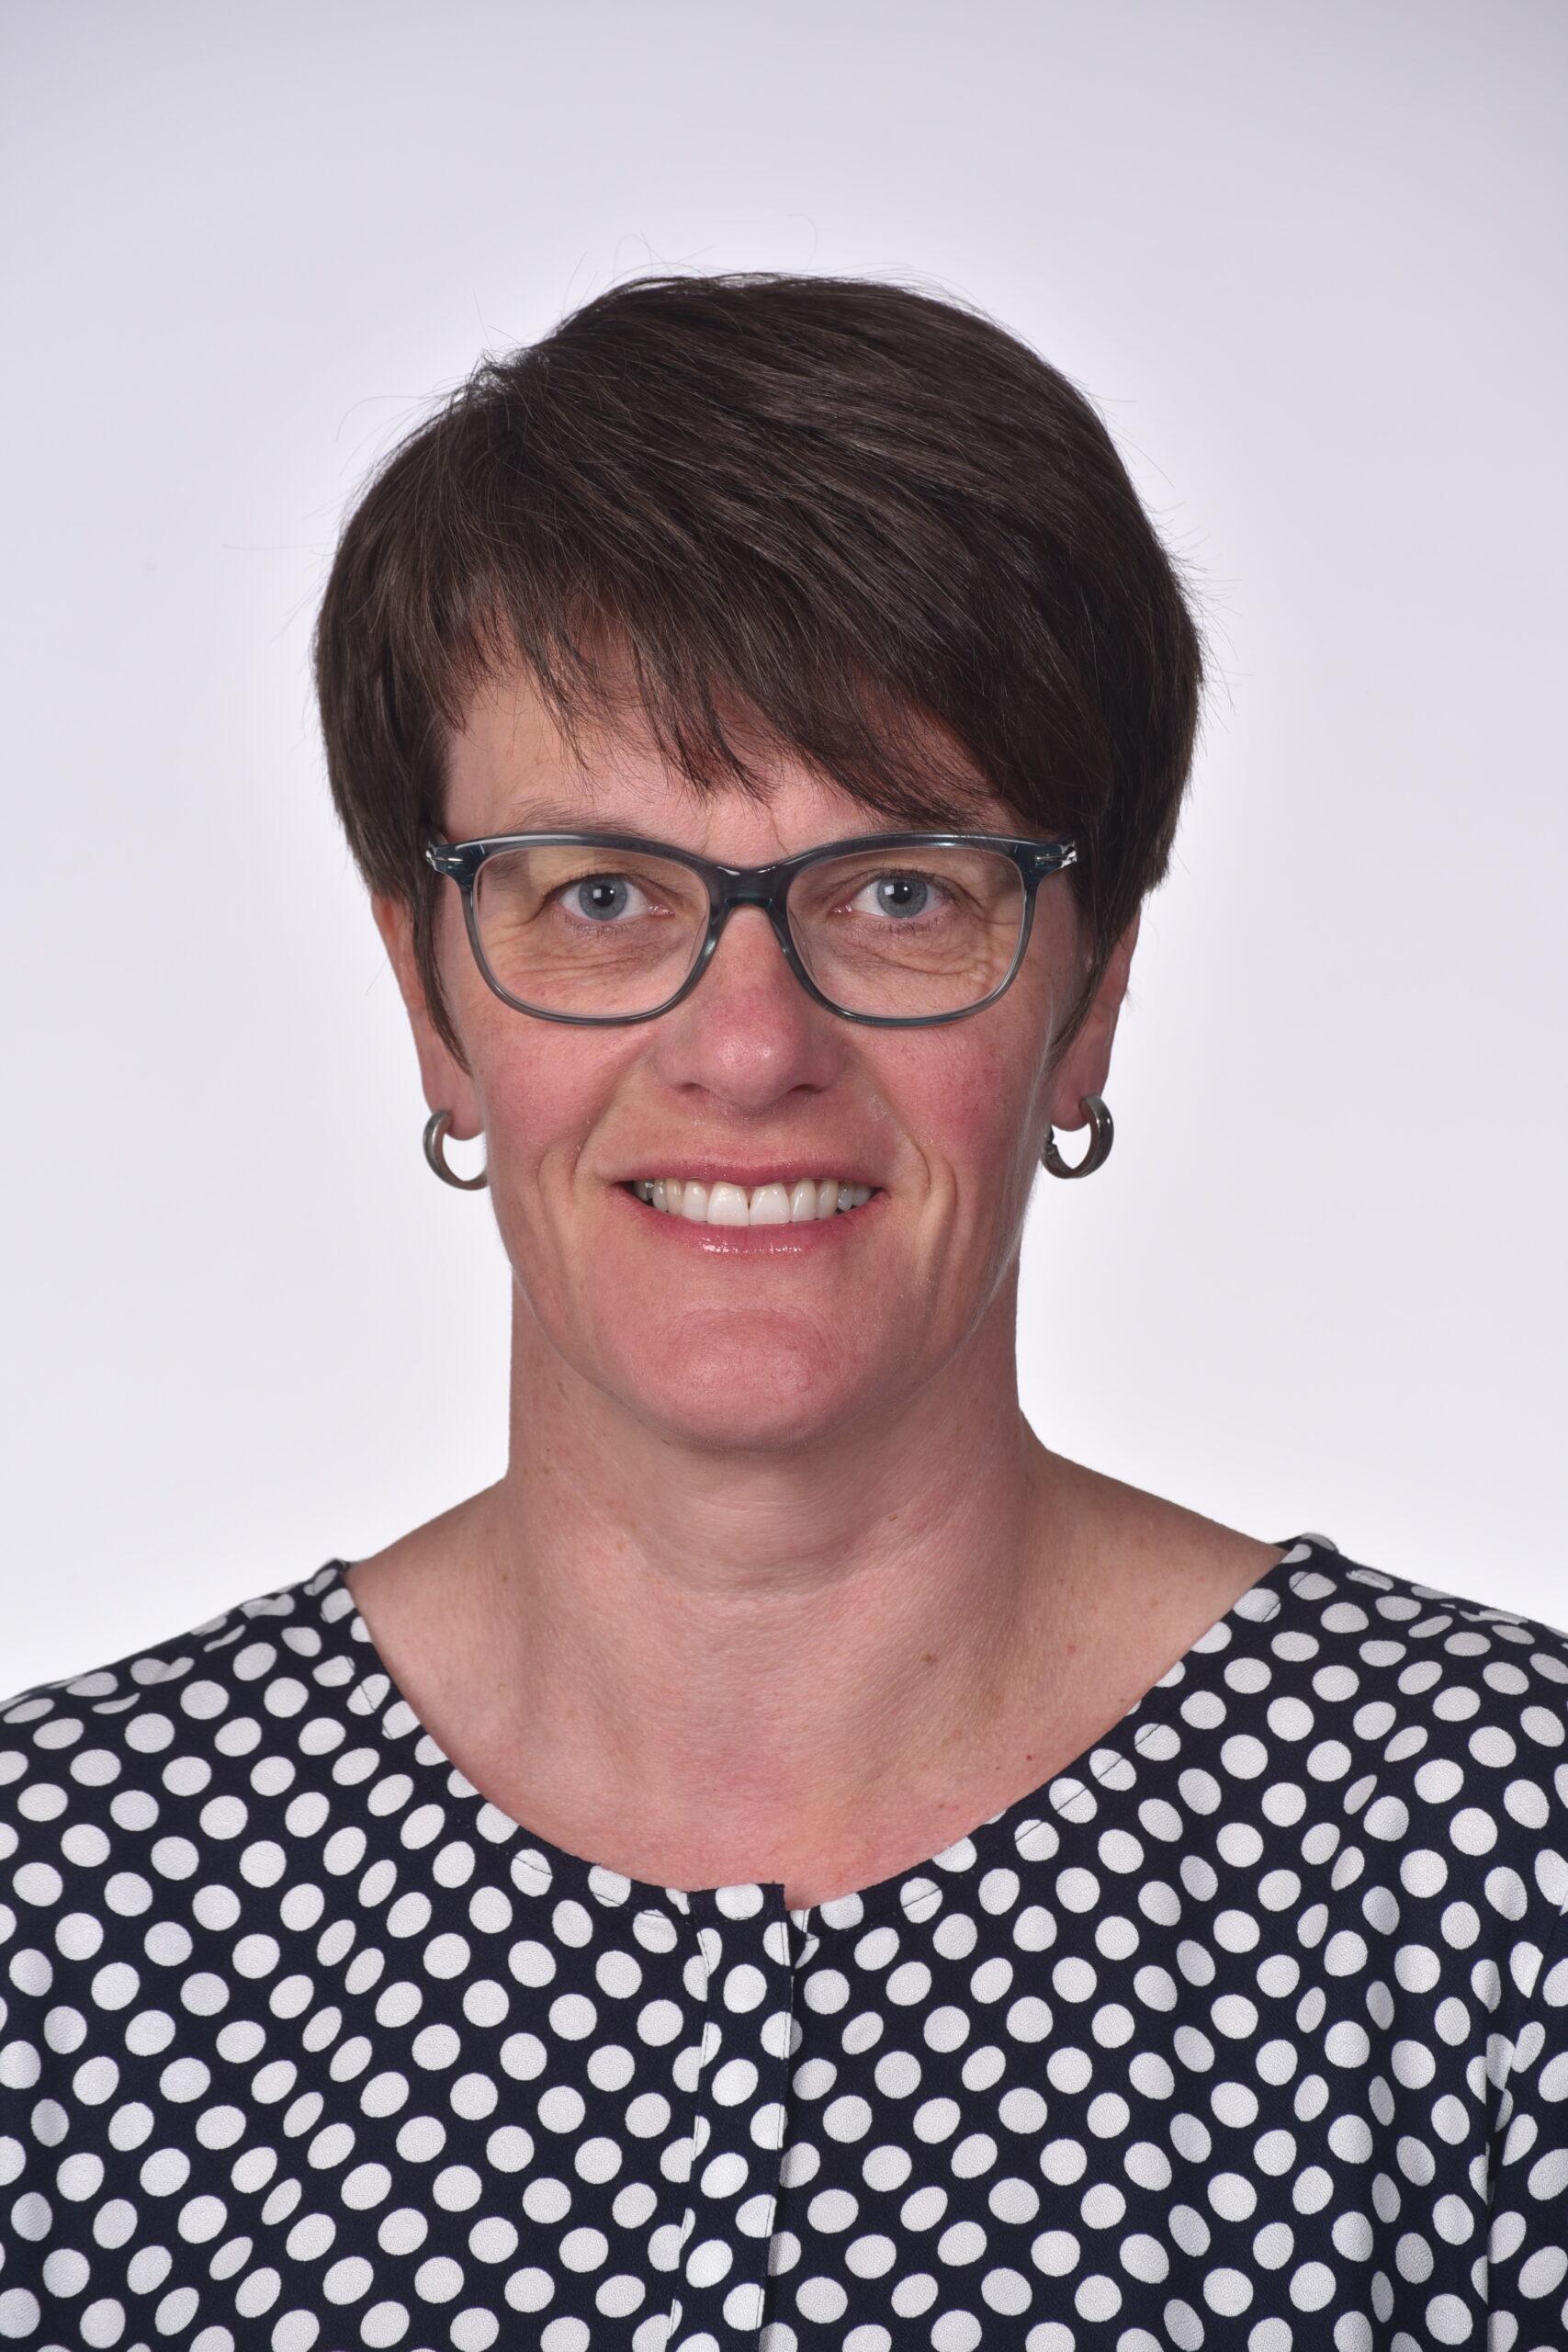 Daniela Kuchen